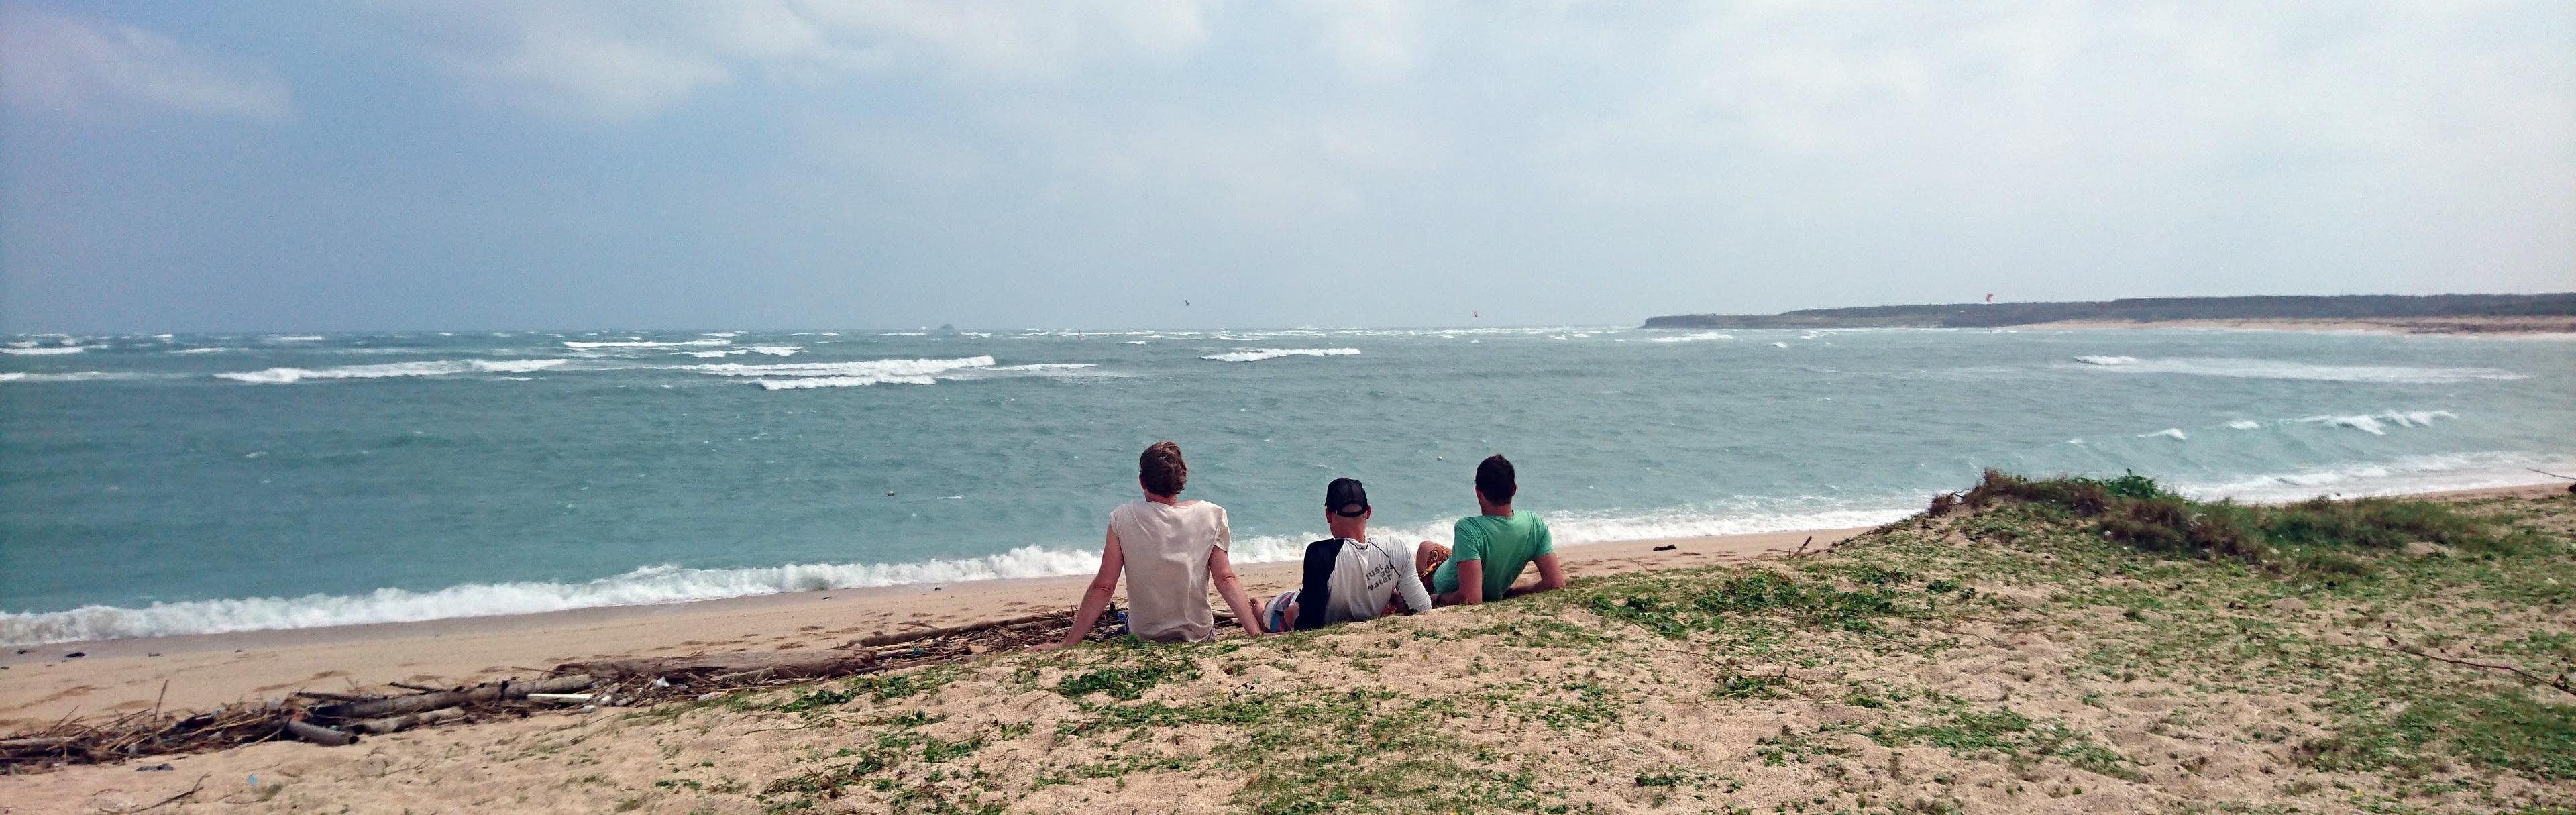 Chilling at Longmen beach